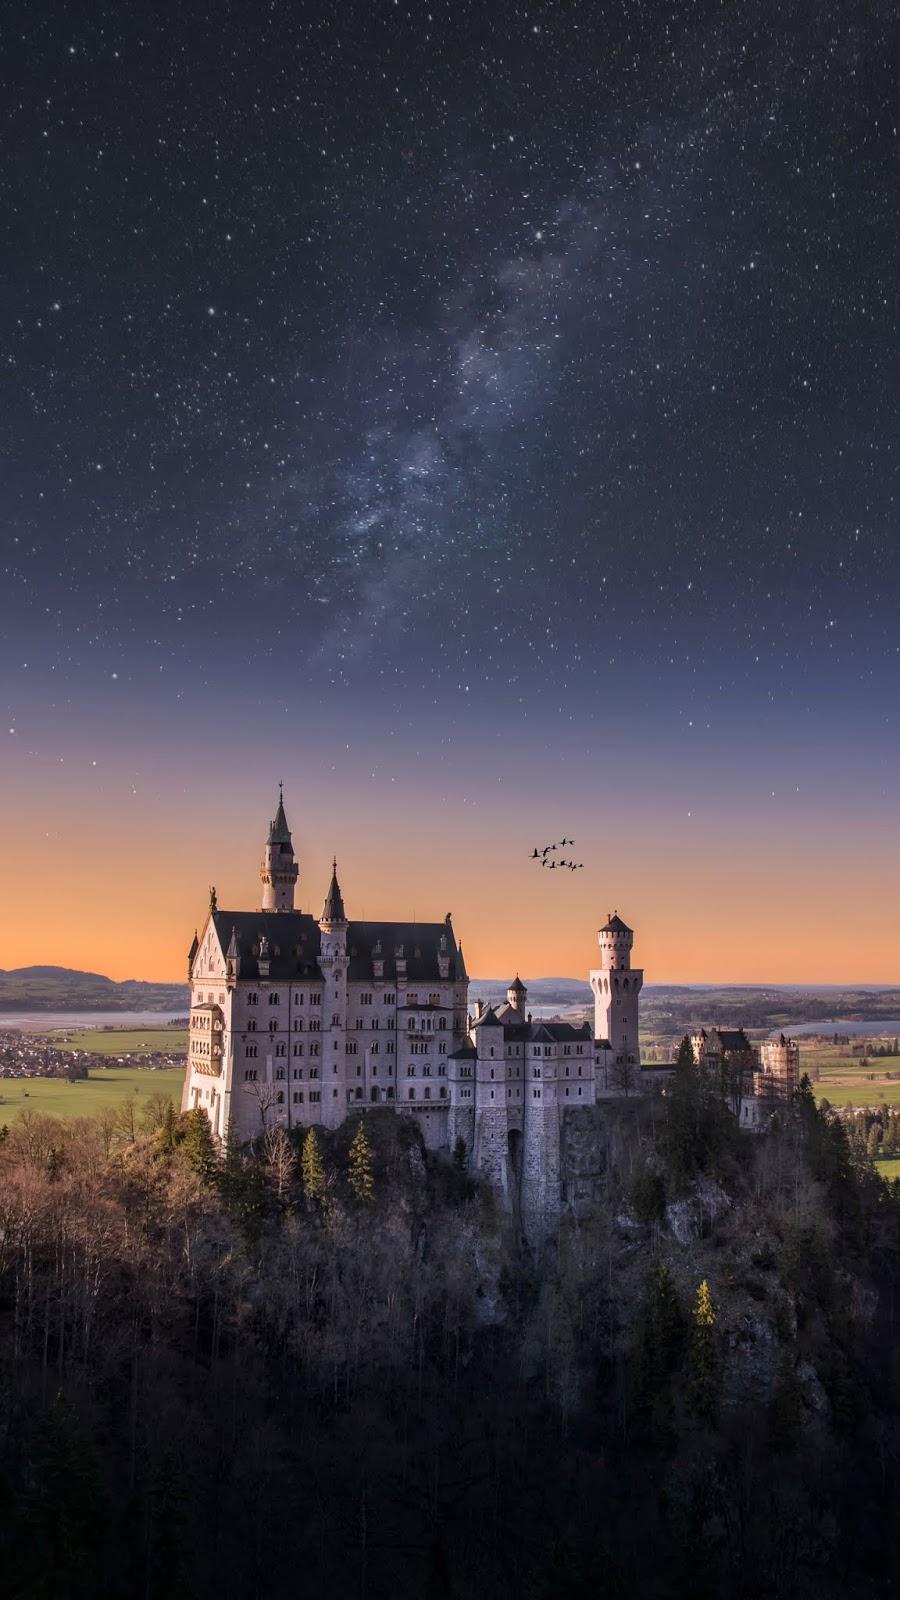 Castle in the starry night by Massimiliano Morosinotto